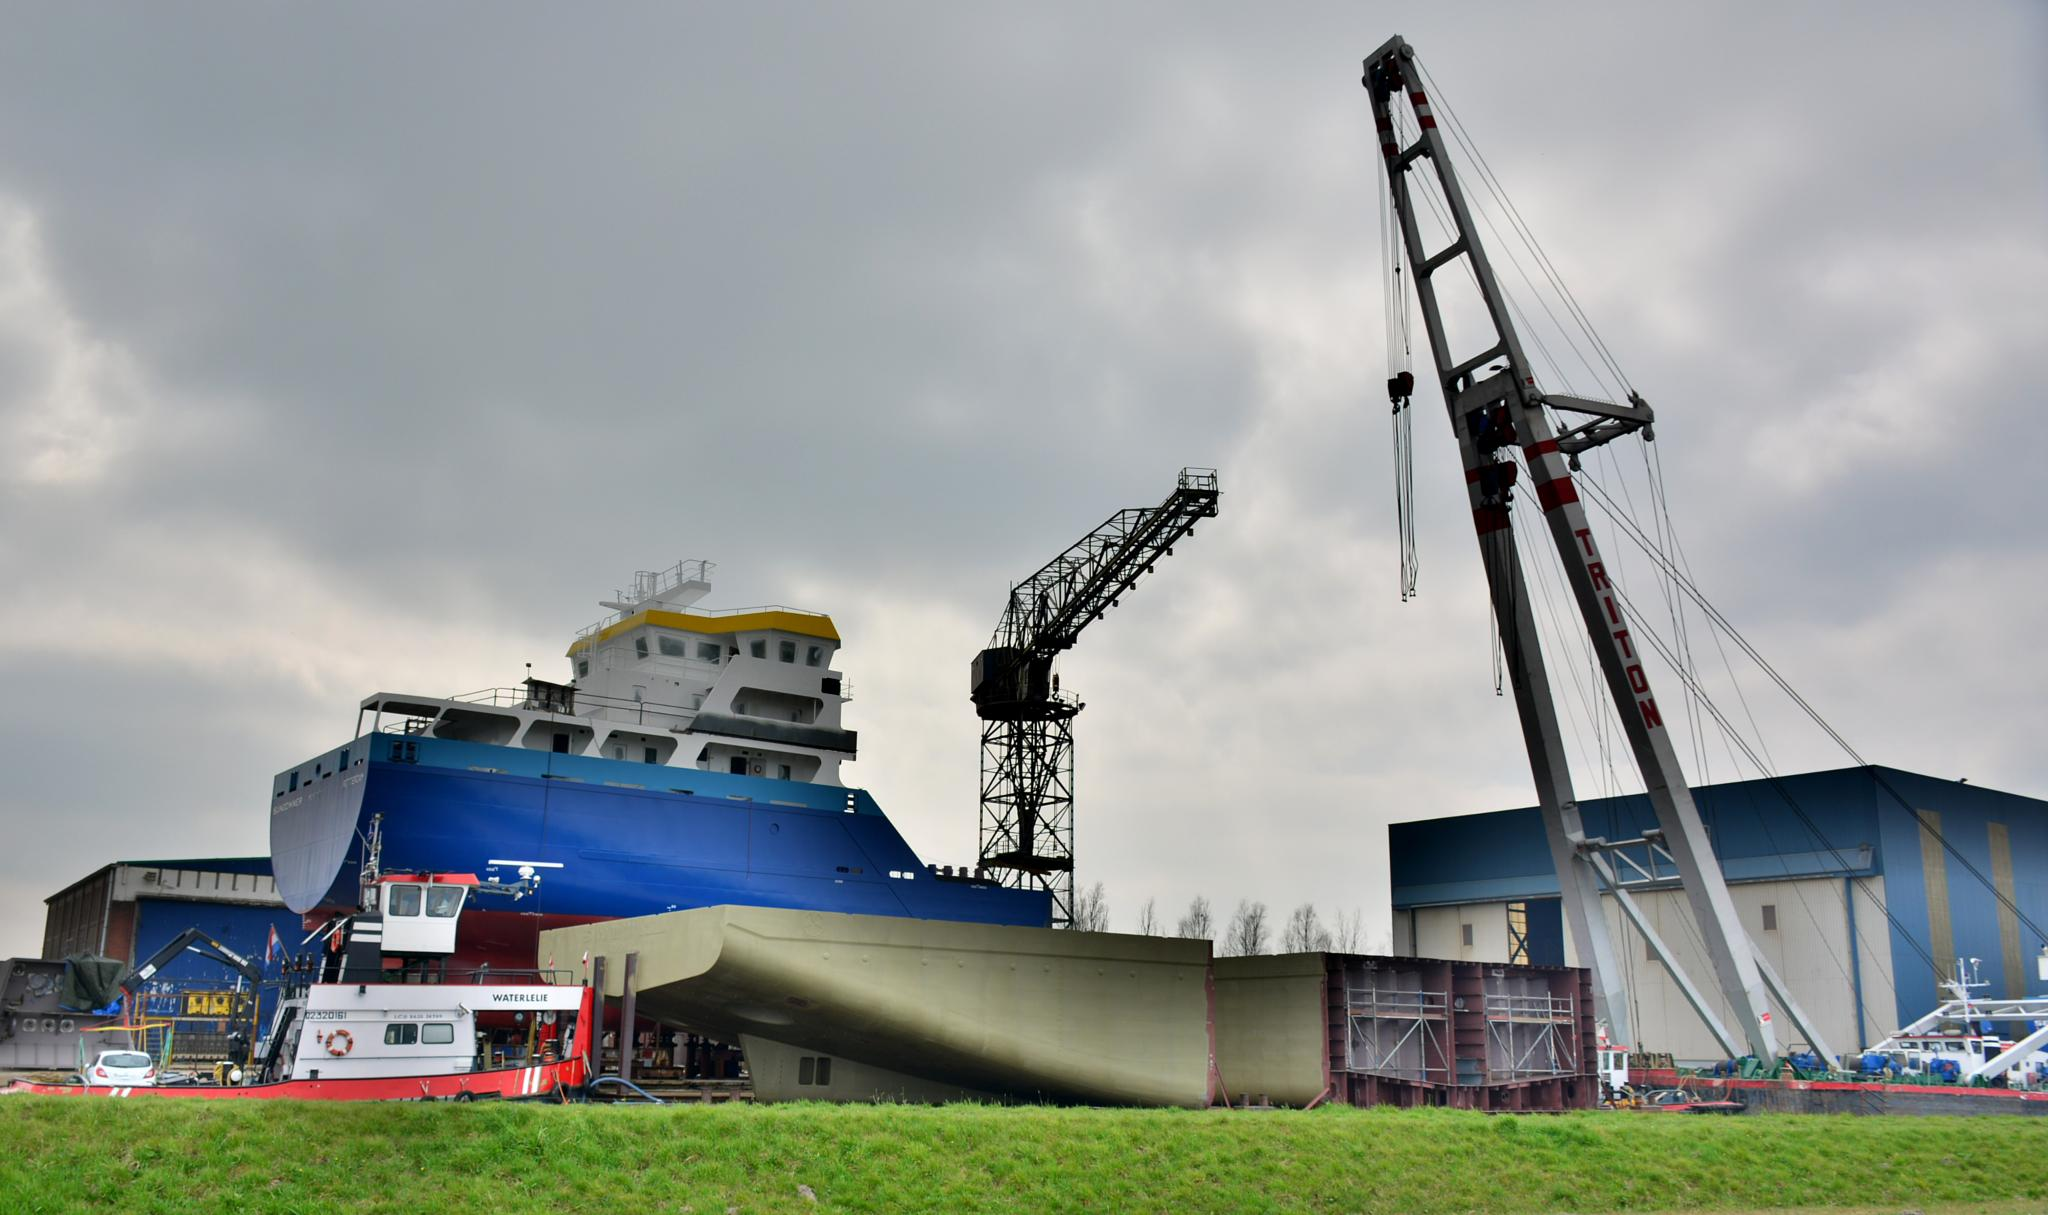 shipyard by allard.vanderweide